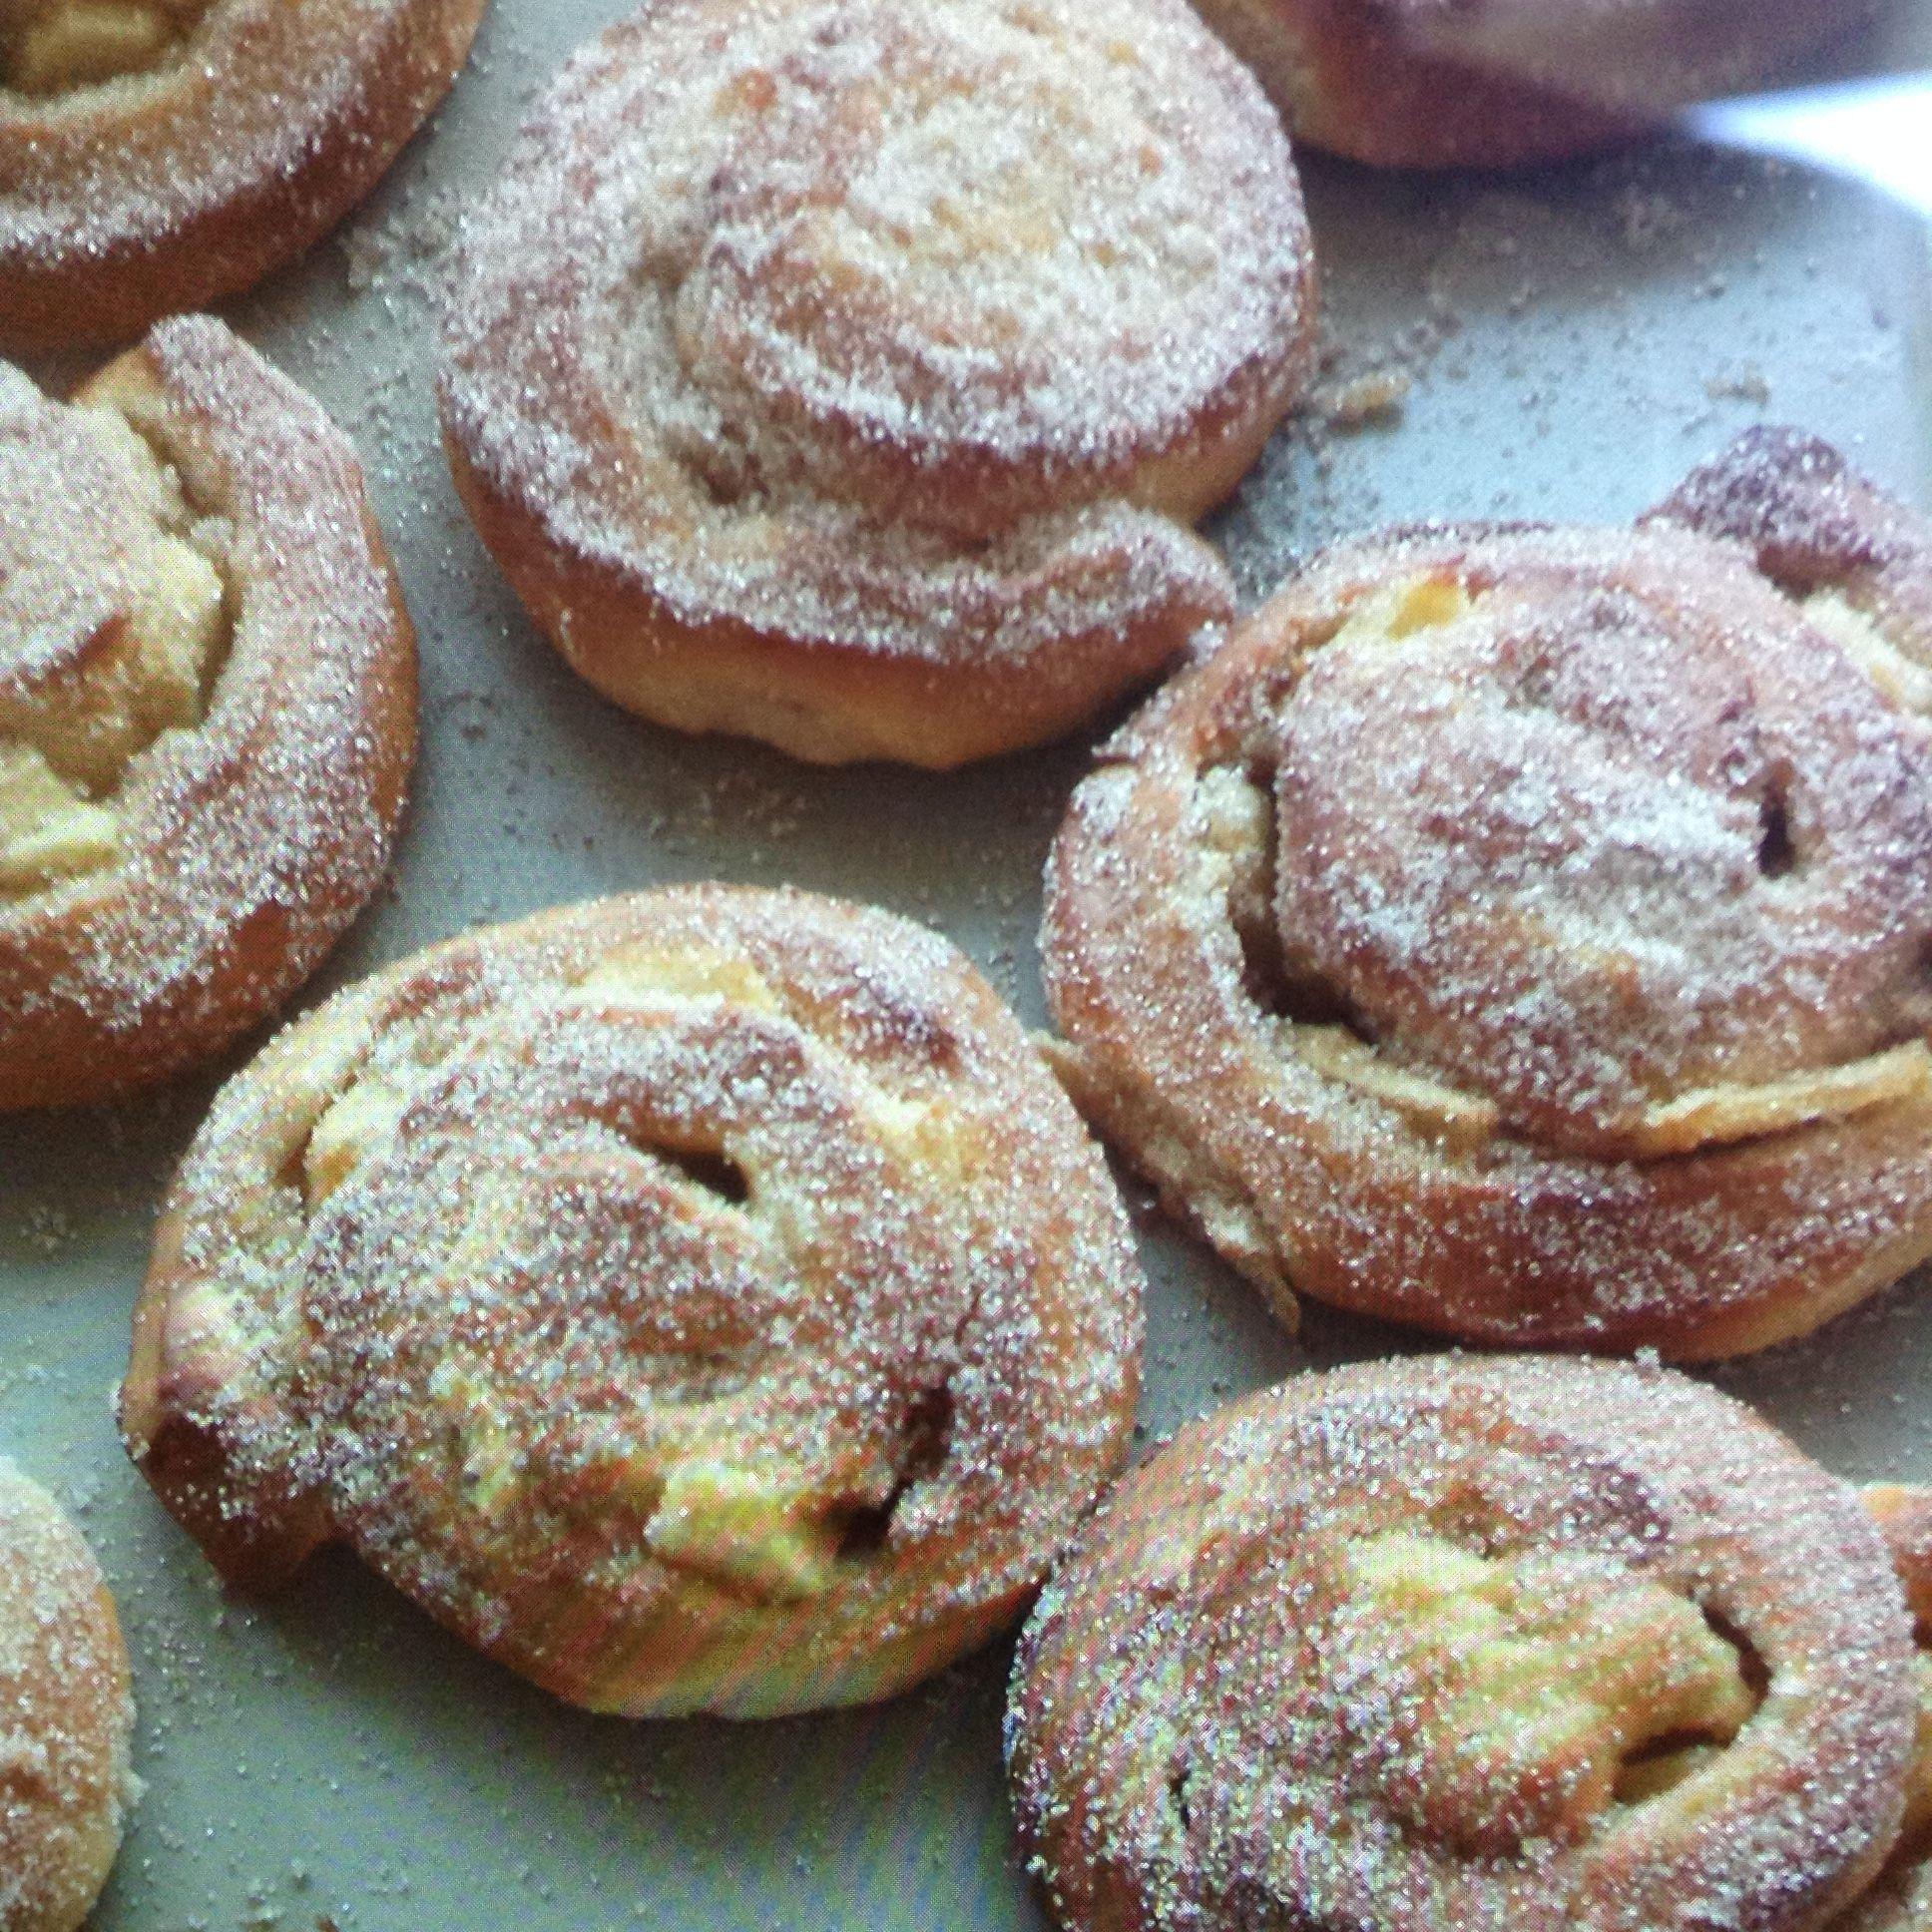 Leckere Amerikanische Kuchen Rezepte Dresdner Eierschecke Dresden